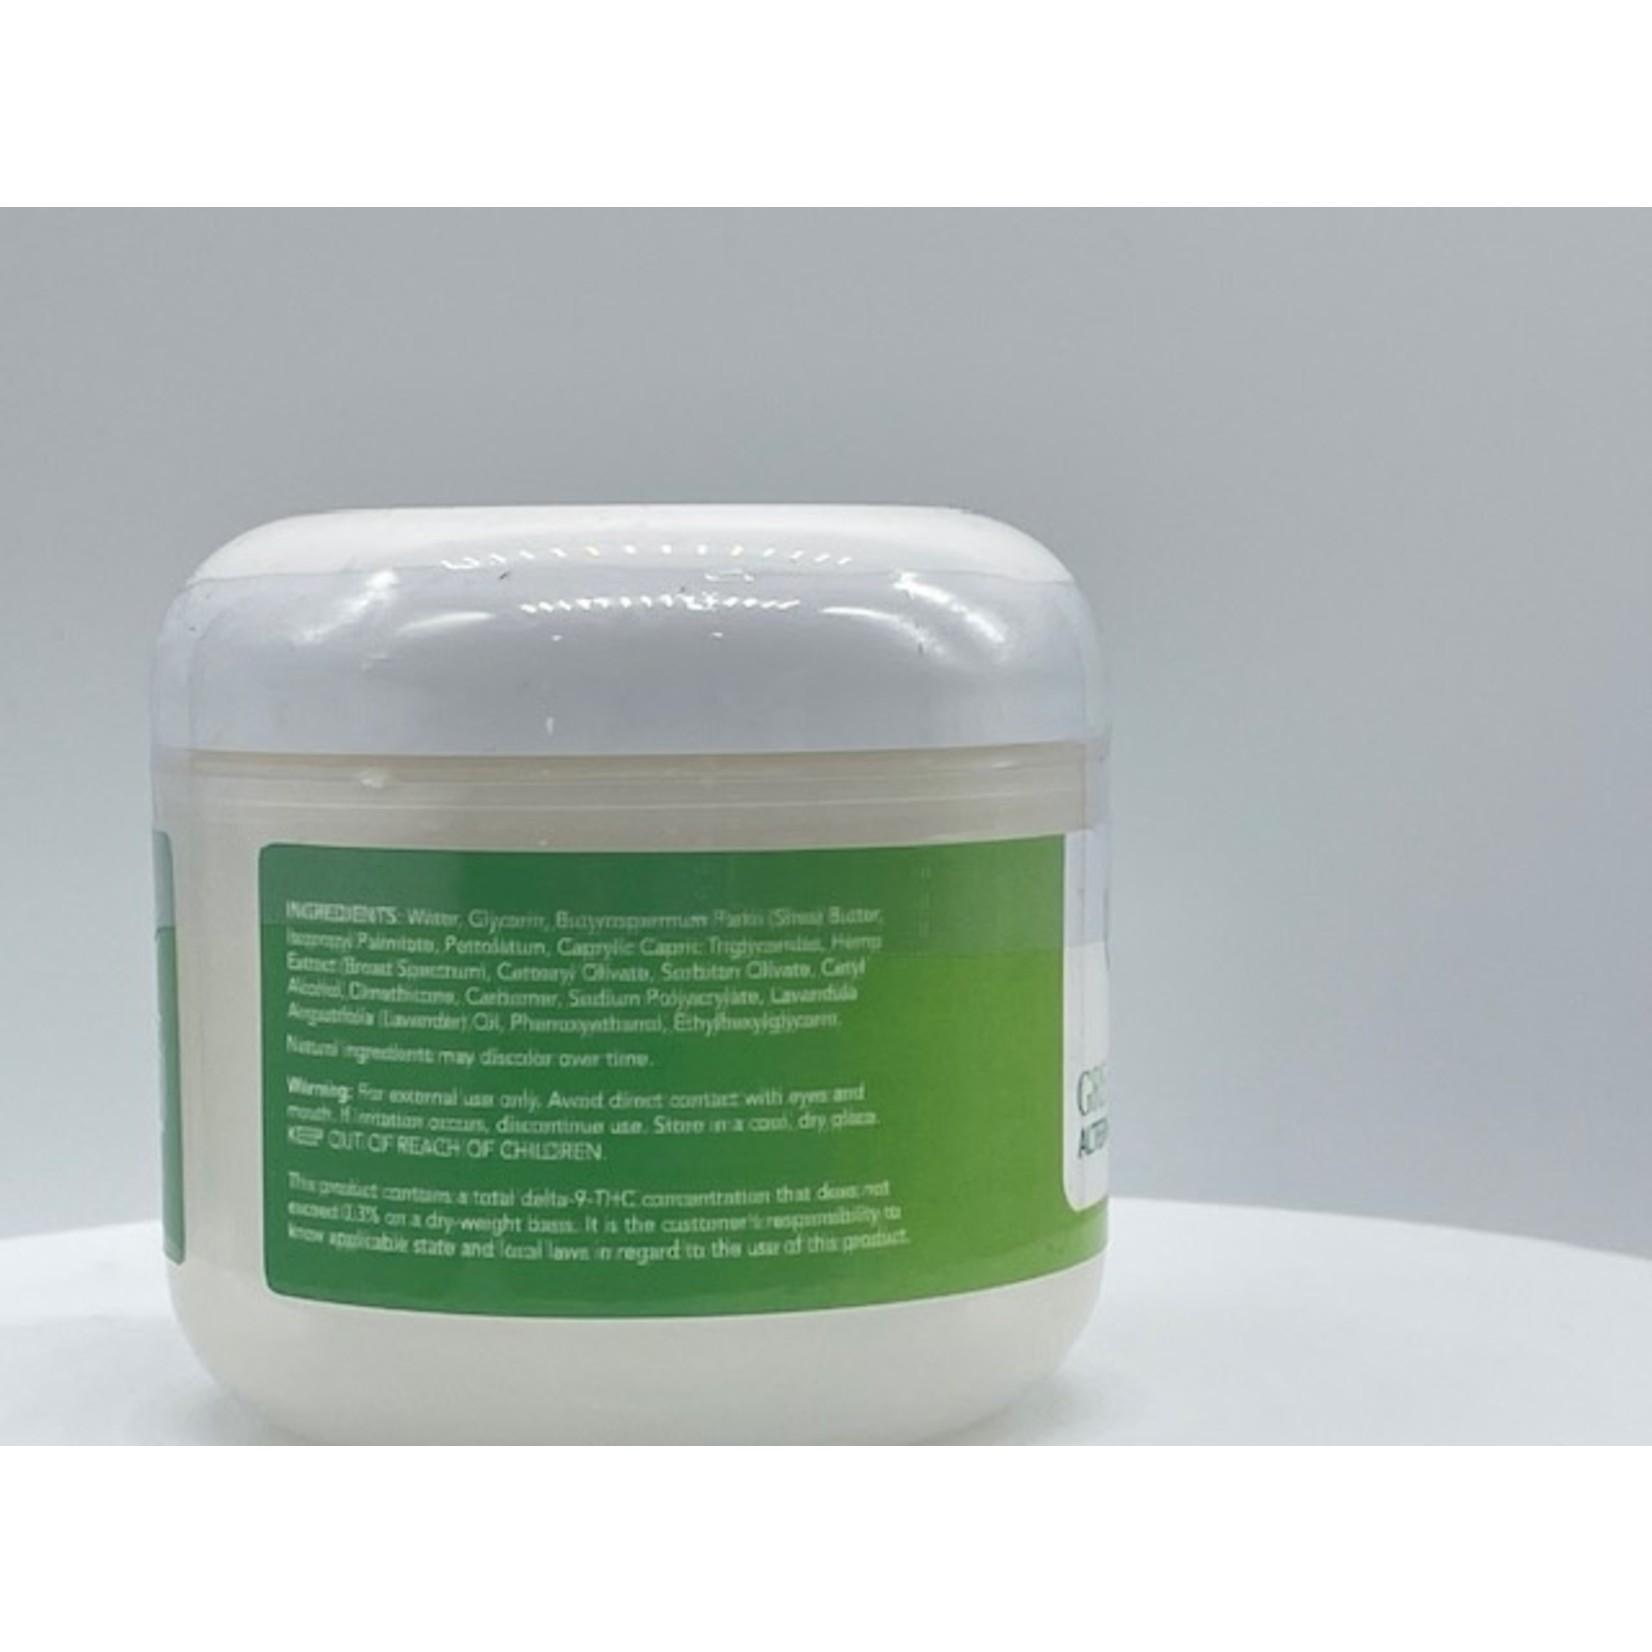 GLAC GLAC CBD Moisturizing Body Butter 100mg